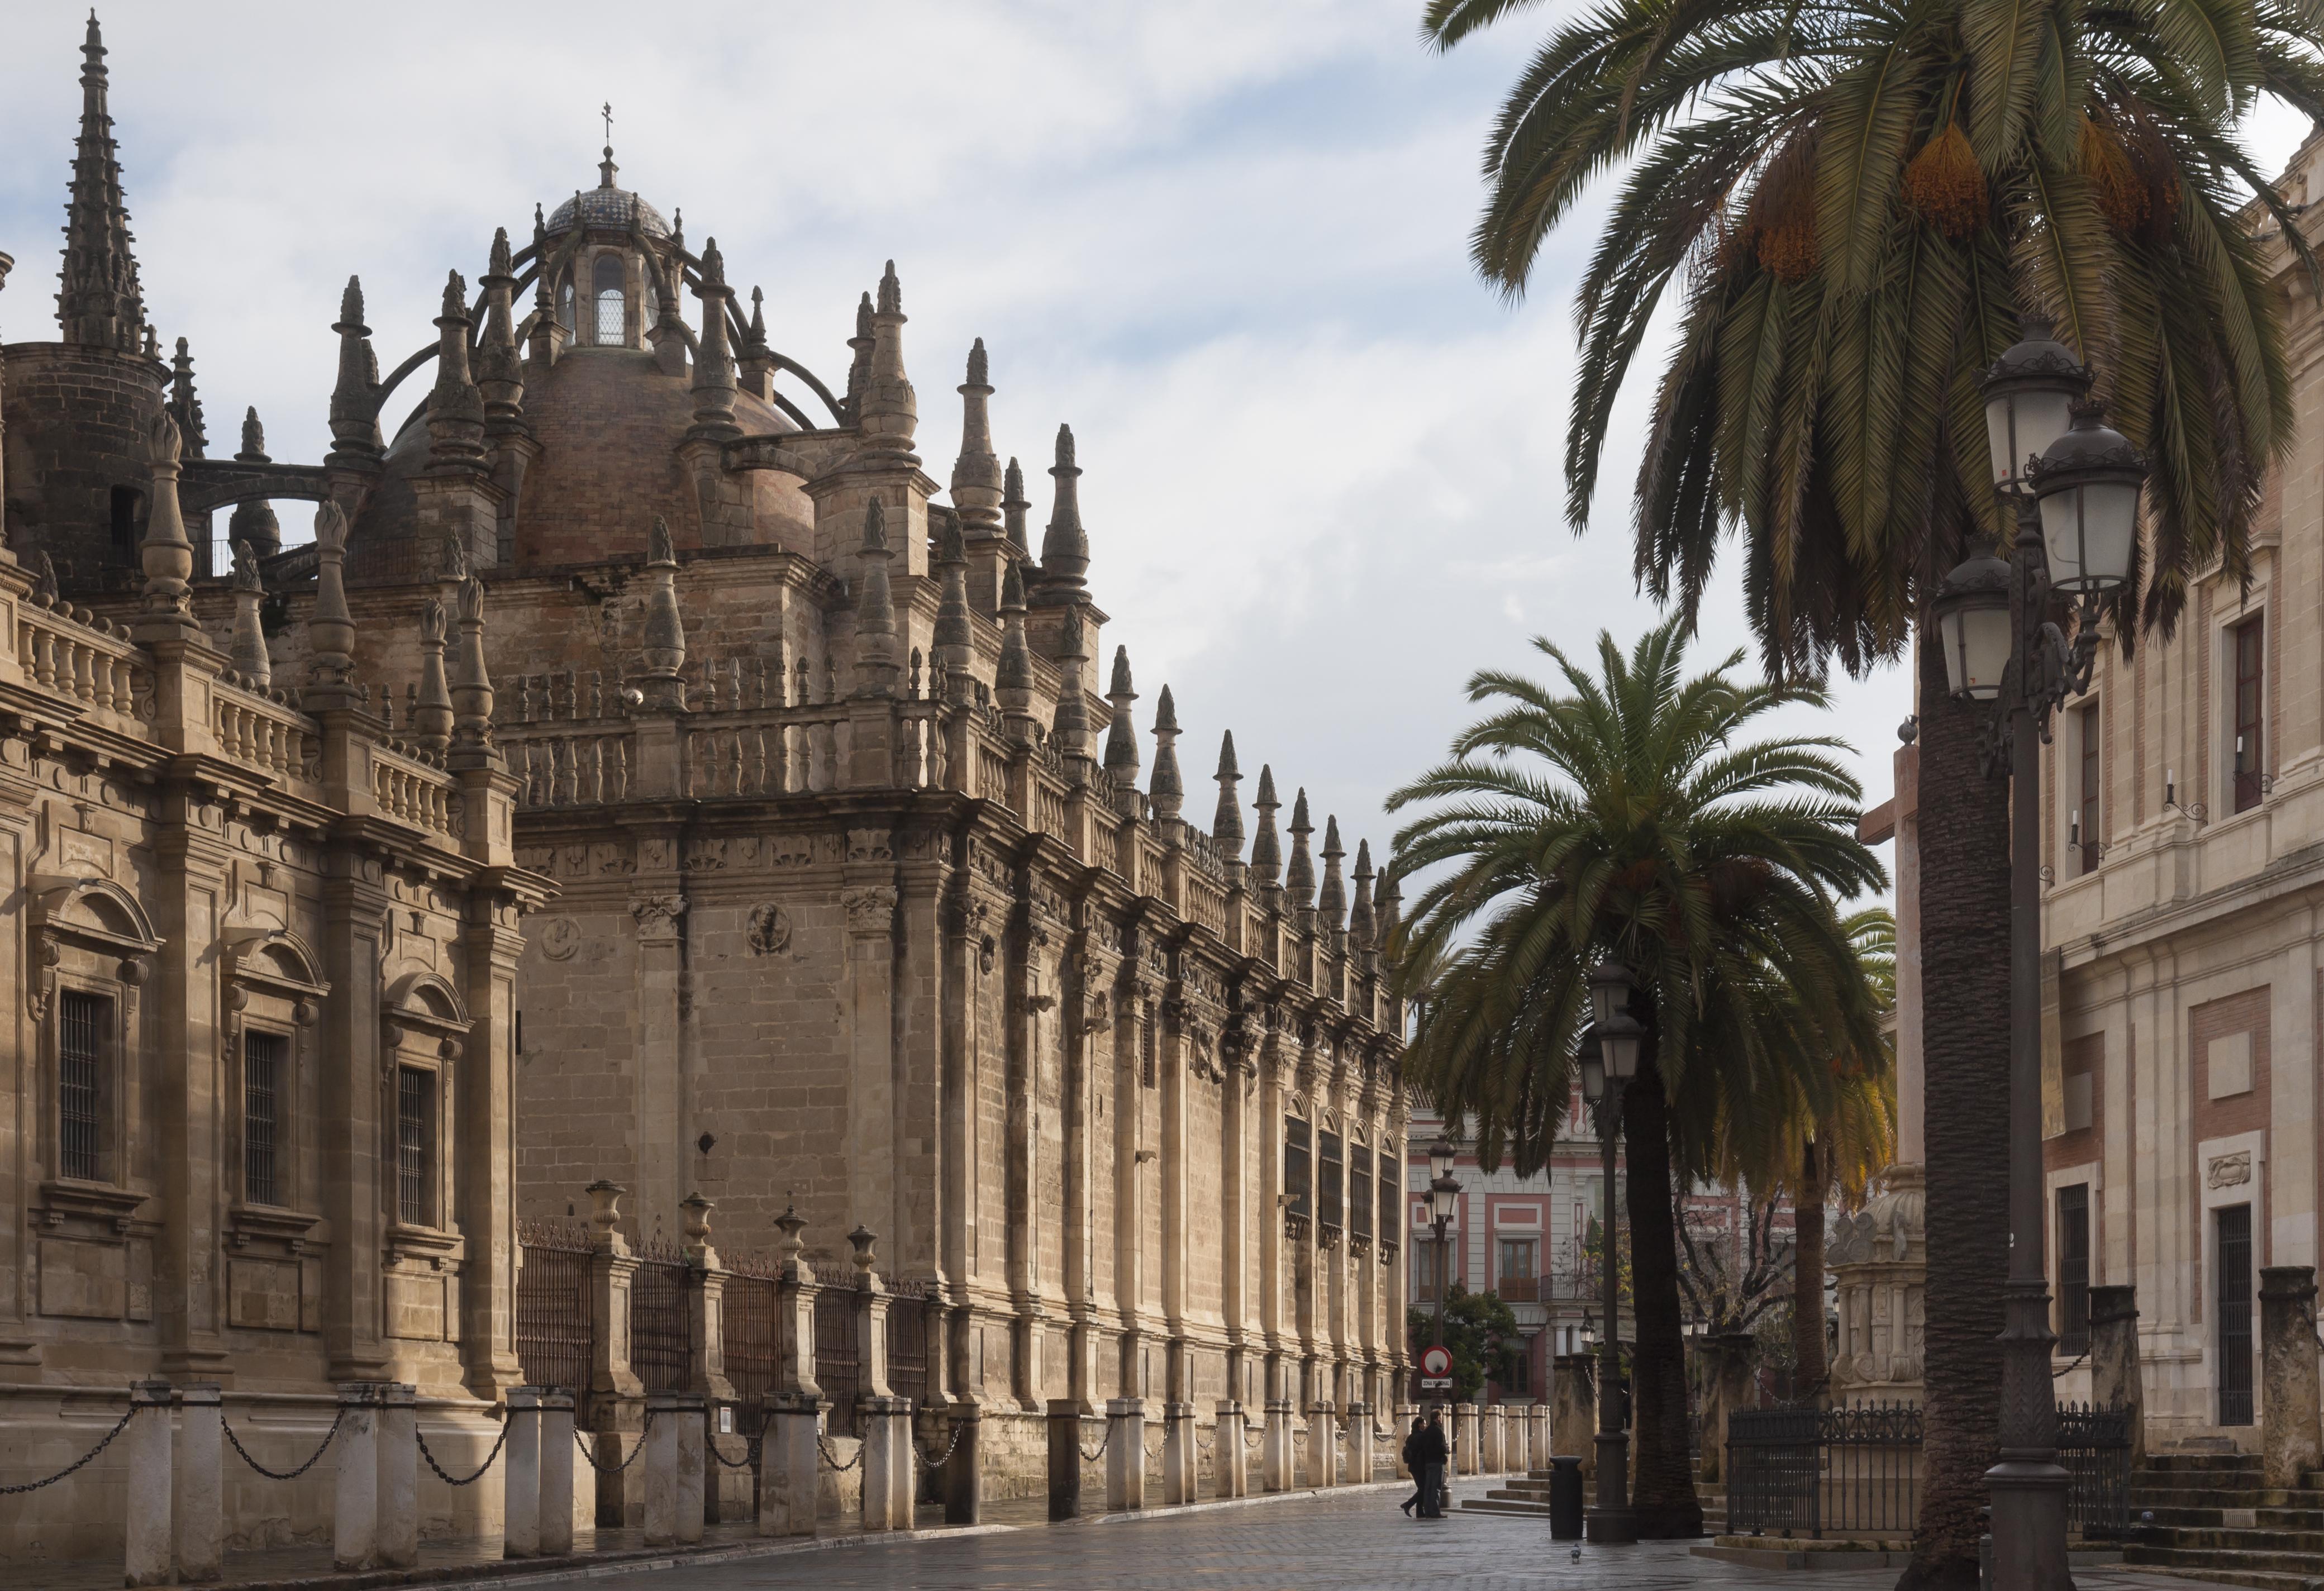 https://upload.wikimedia.org/wikipedia/commons/d/df/Sevilla_Spain_Calle-Fray-Ceferino-Gonzales-01.jpg